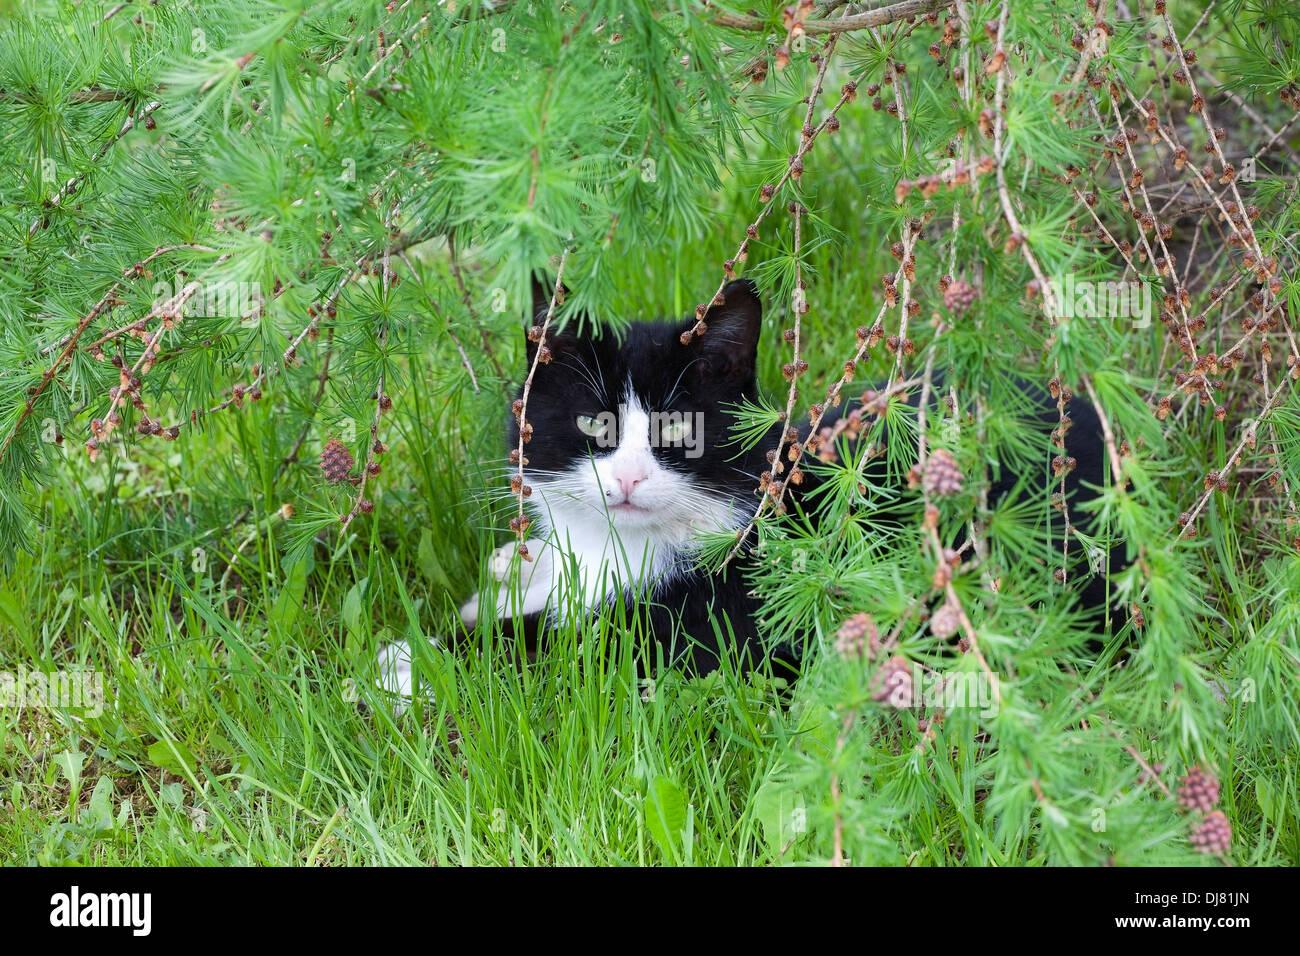 cat breeds - Stock Image